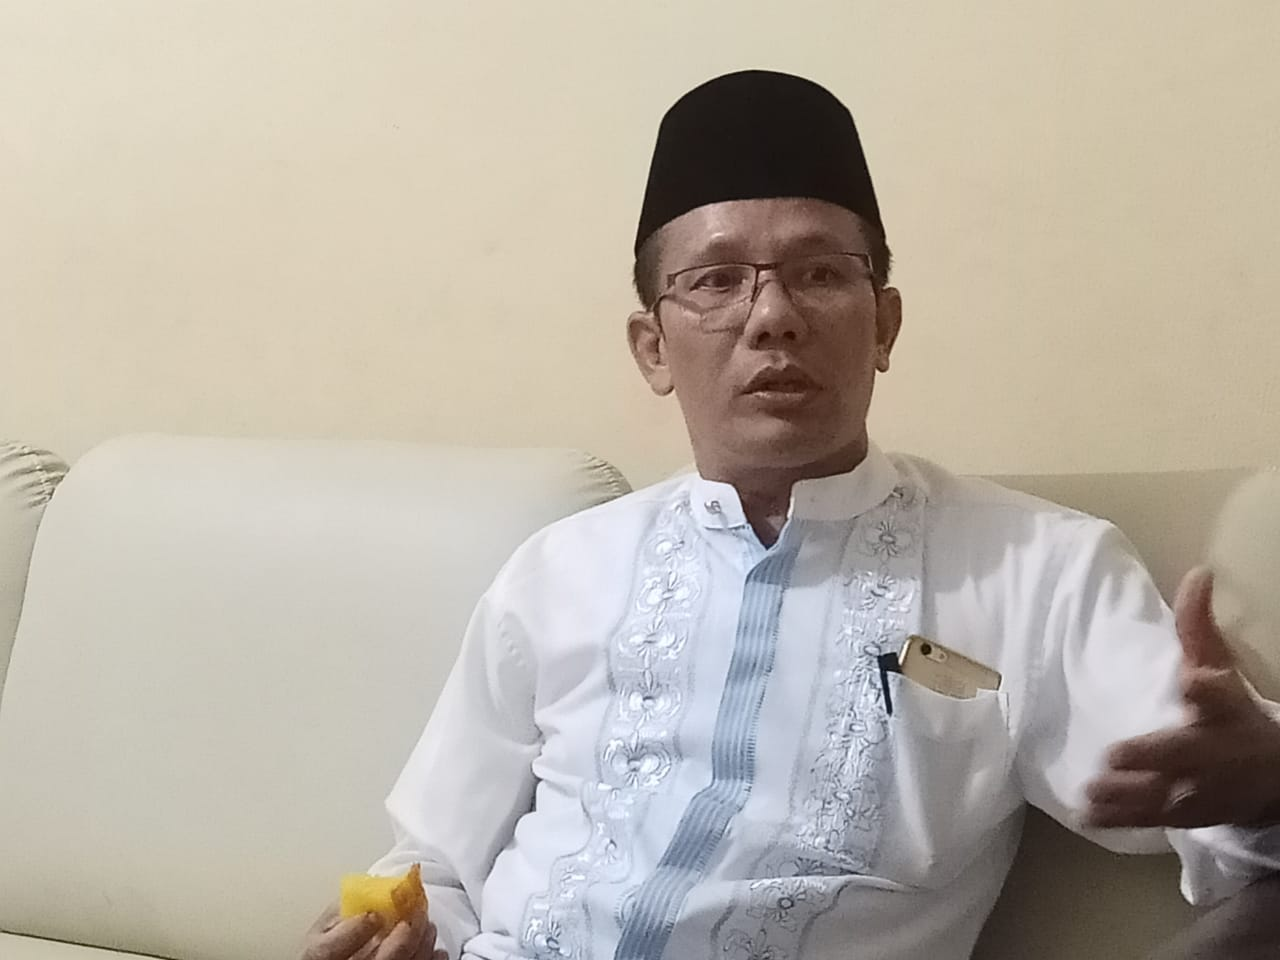 Menag Lantik Dr Danial Sebagai Rektor IAIN Lhokseumawe